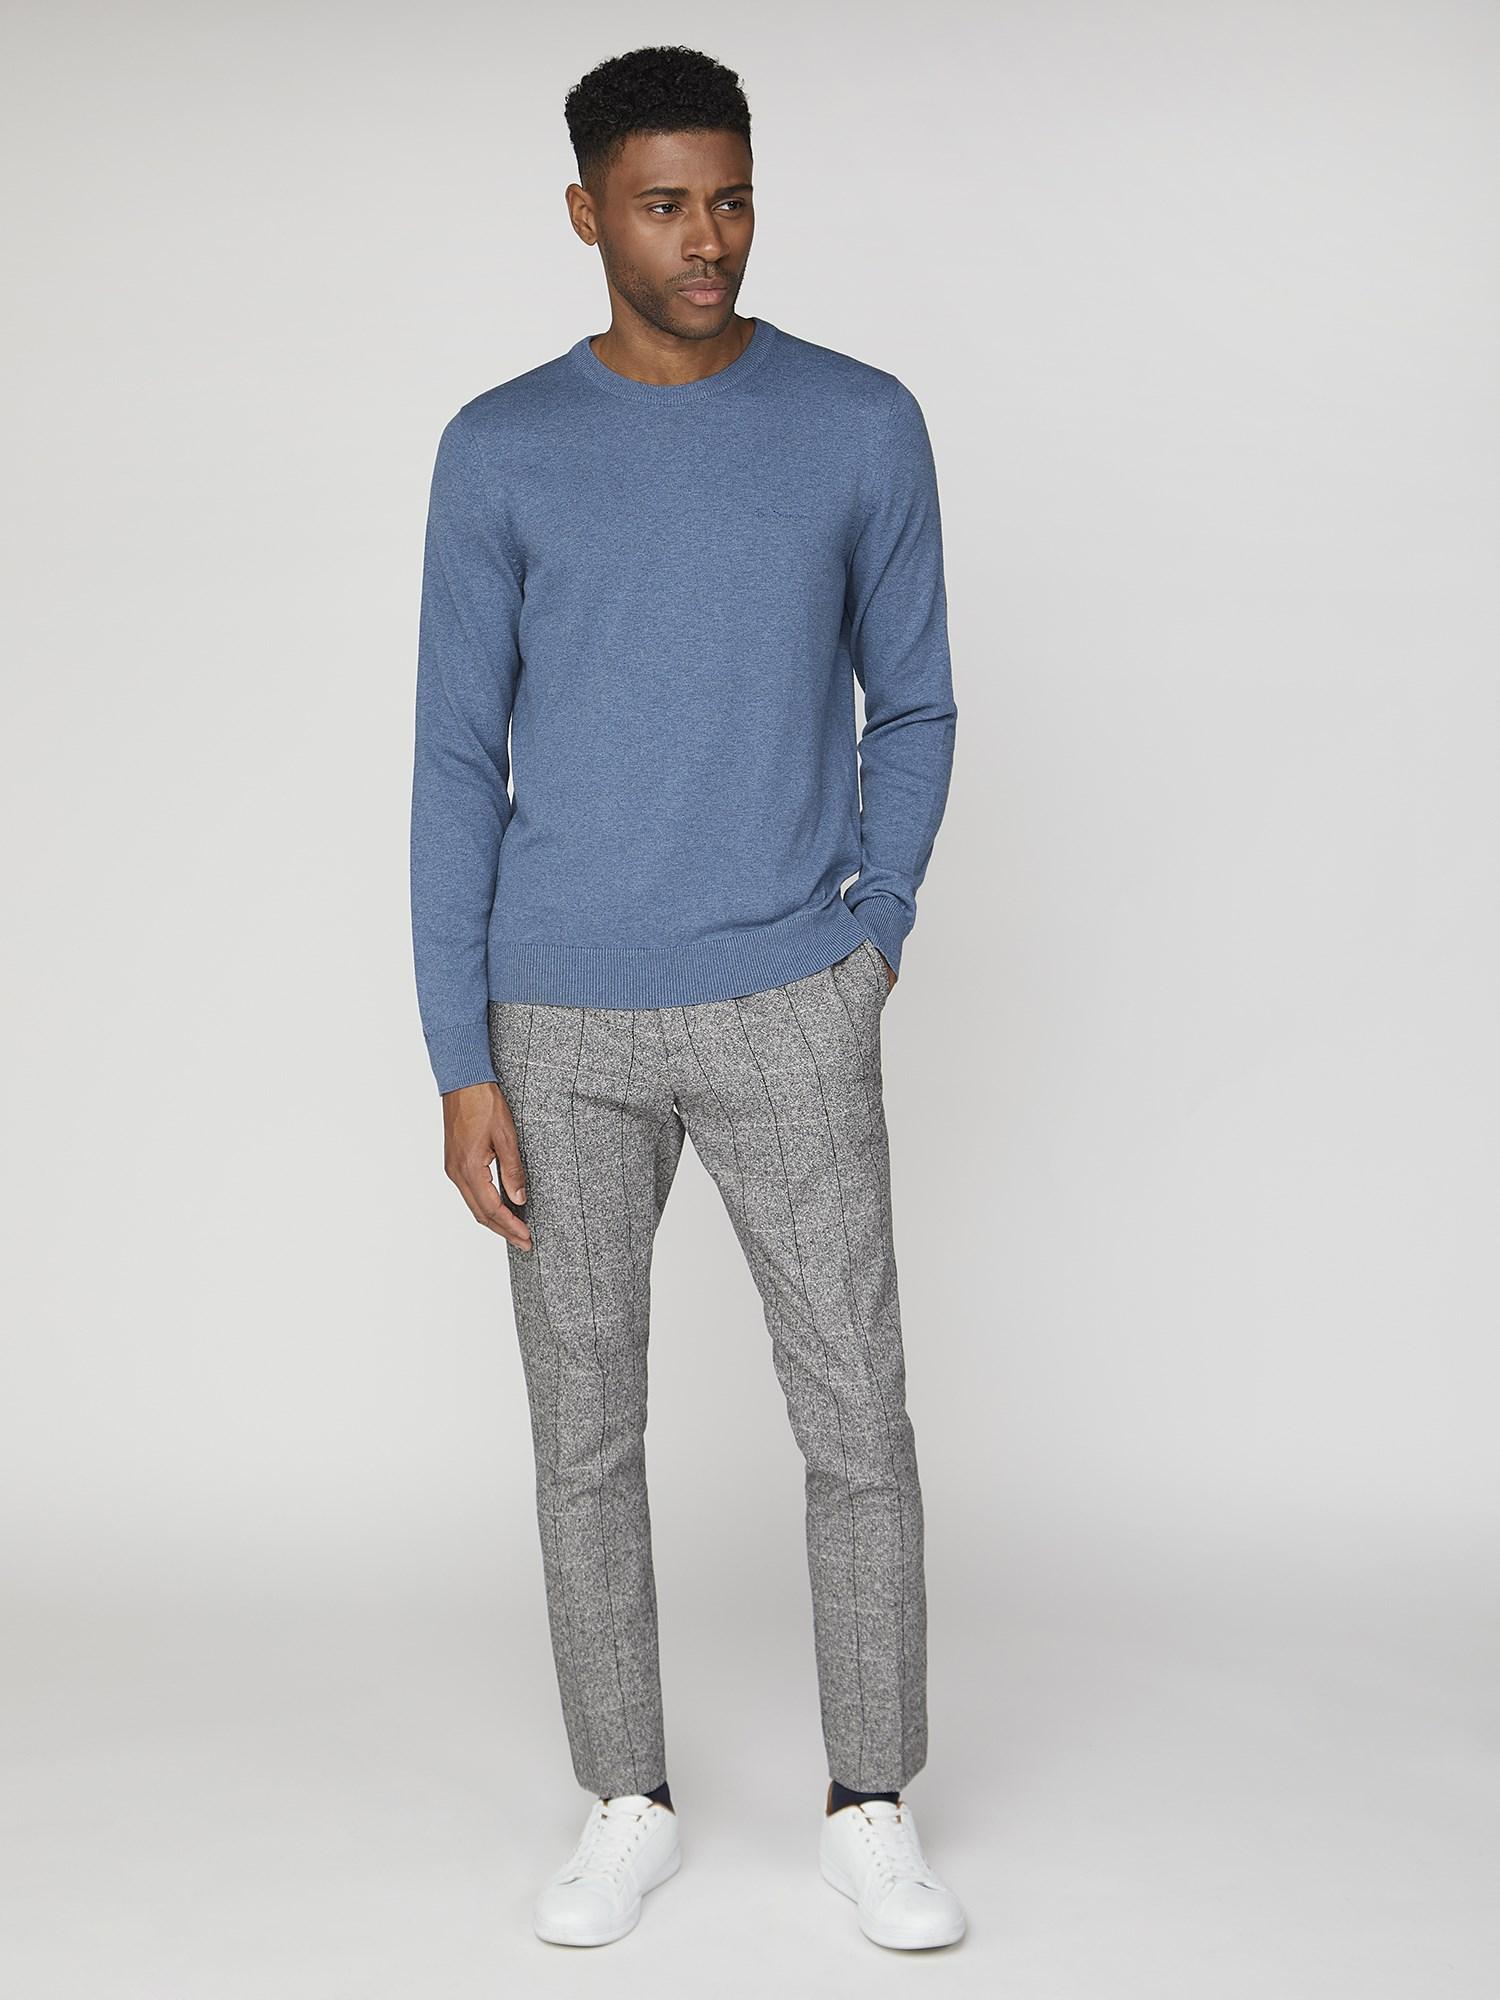 Plain Crew Neck Sweatshirt